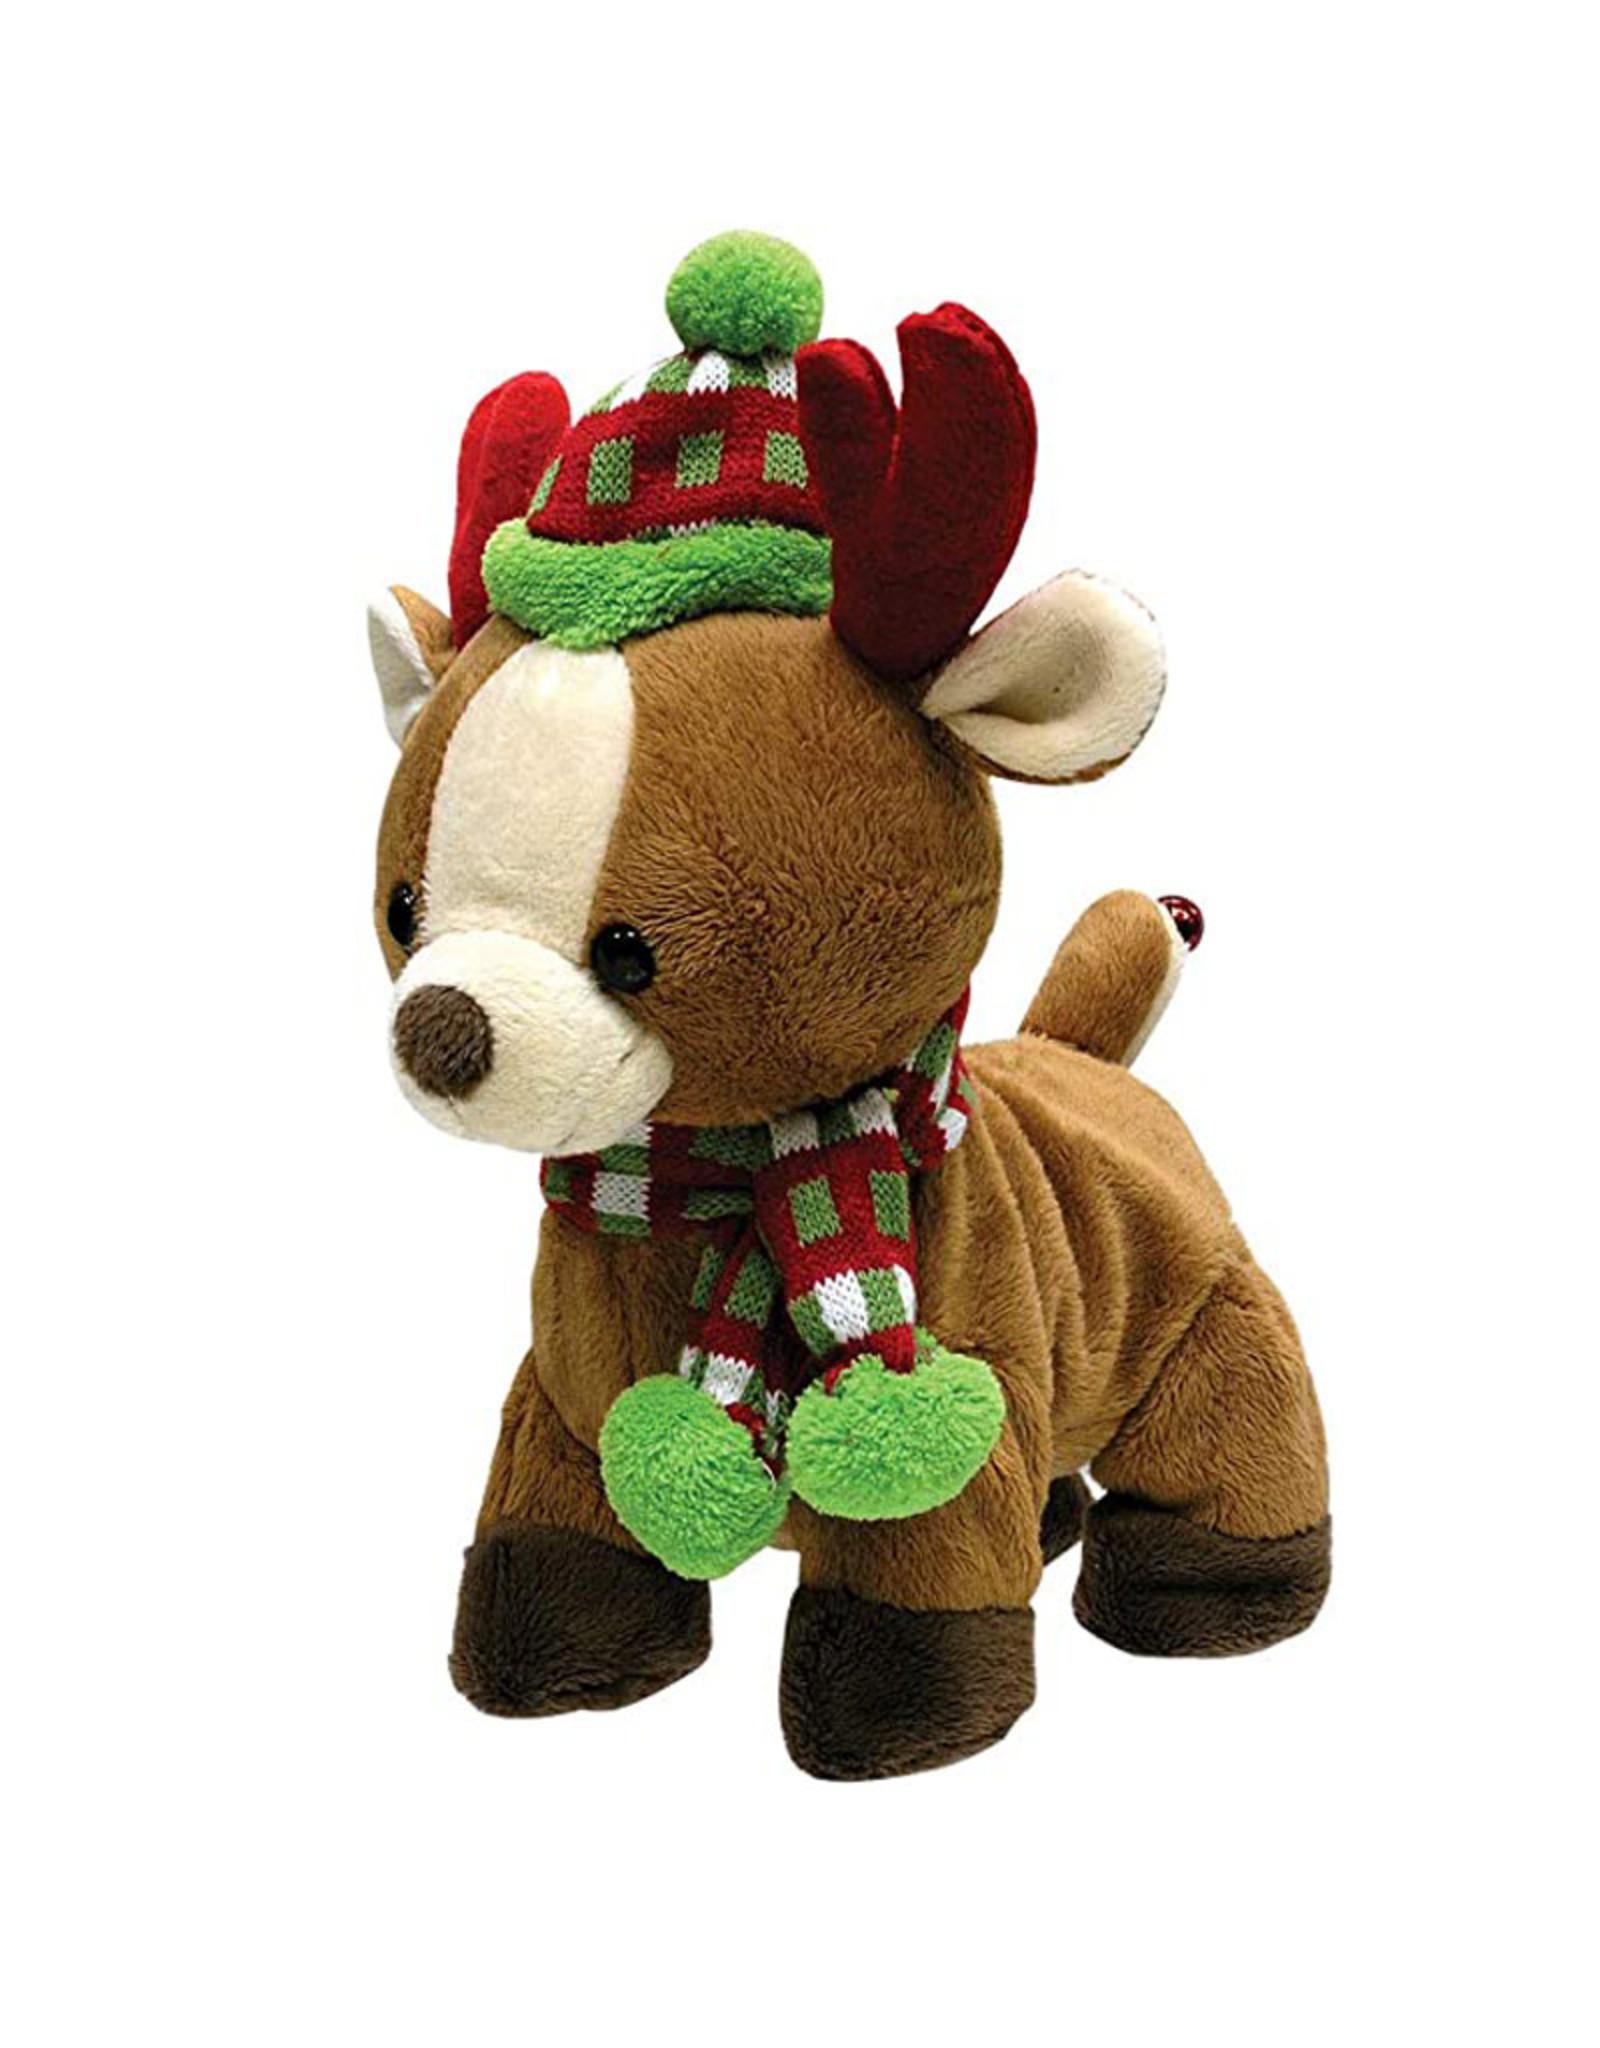 Reindeer ( Cuddle Barn ) Rudolph, the Red-Nosed Reindeer